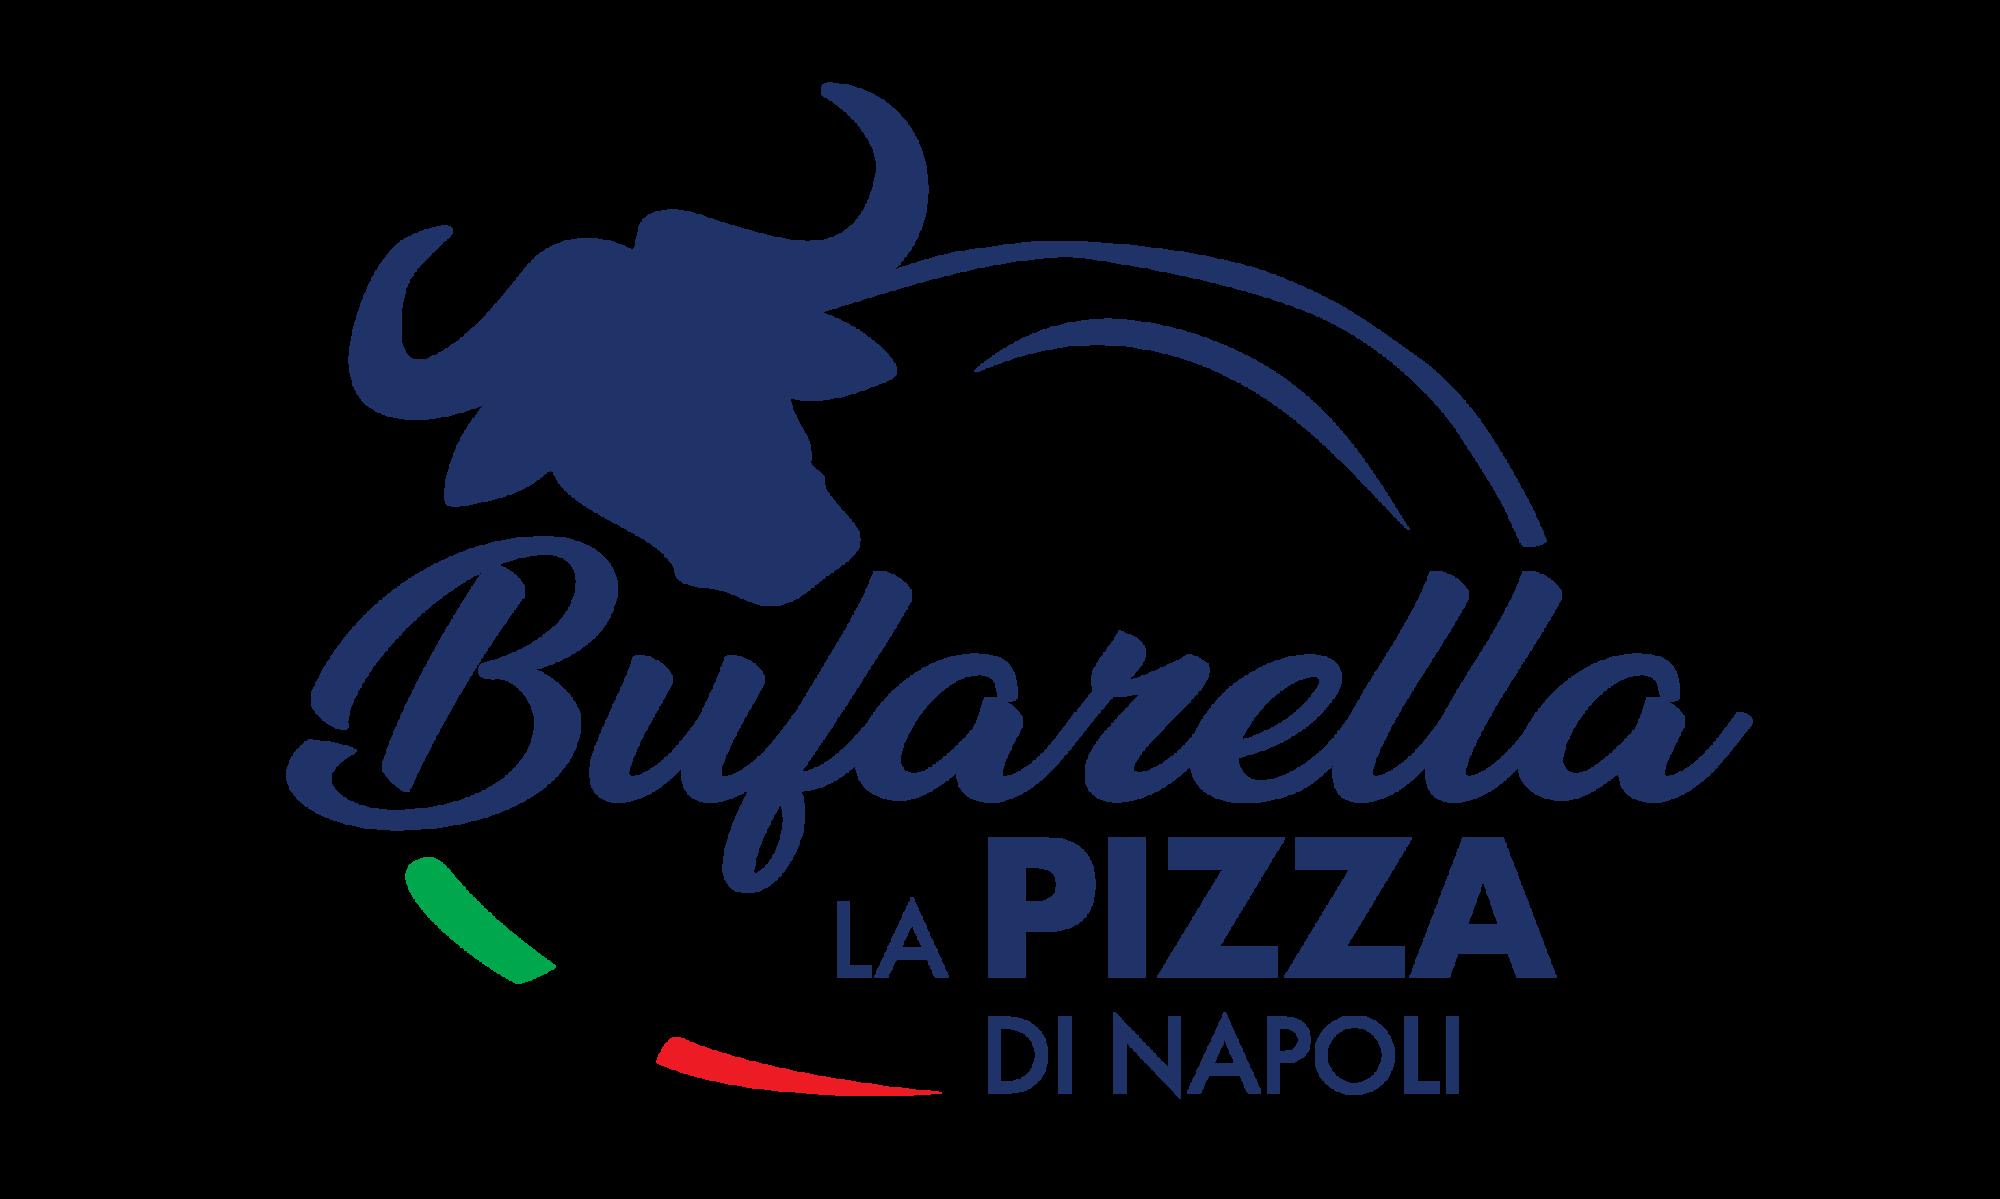 Bufarella LLC